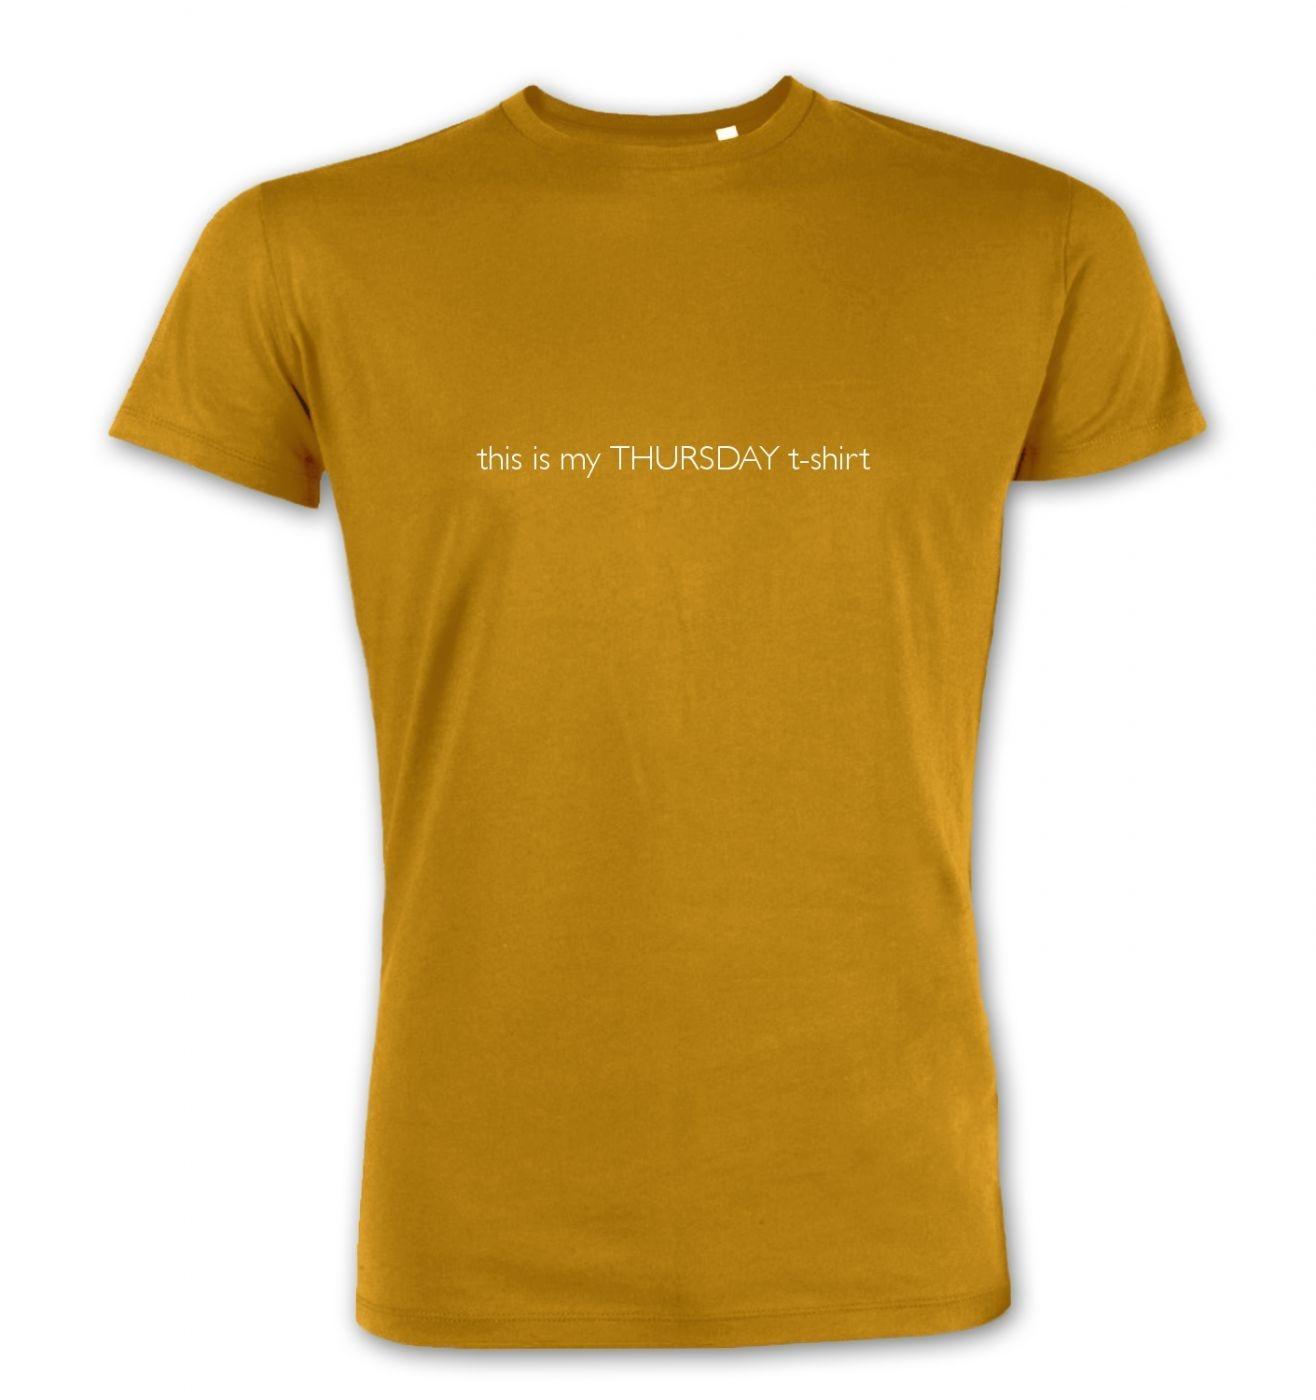 This is my Thursday Premium t-shirt men's tee